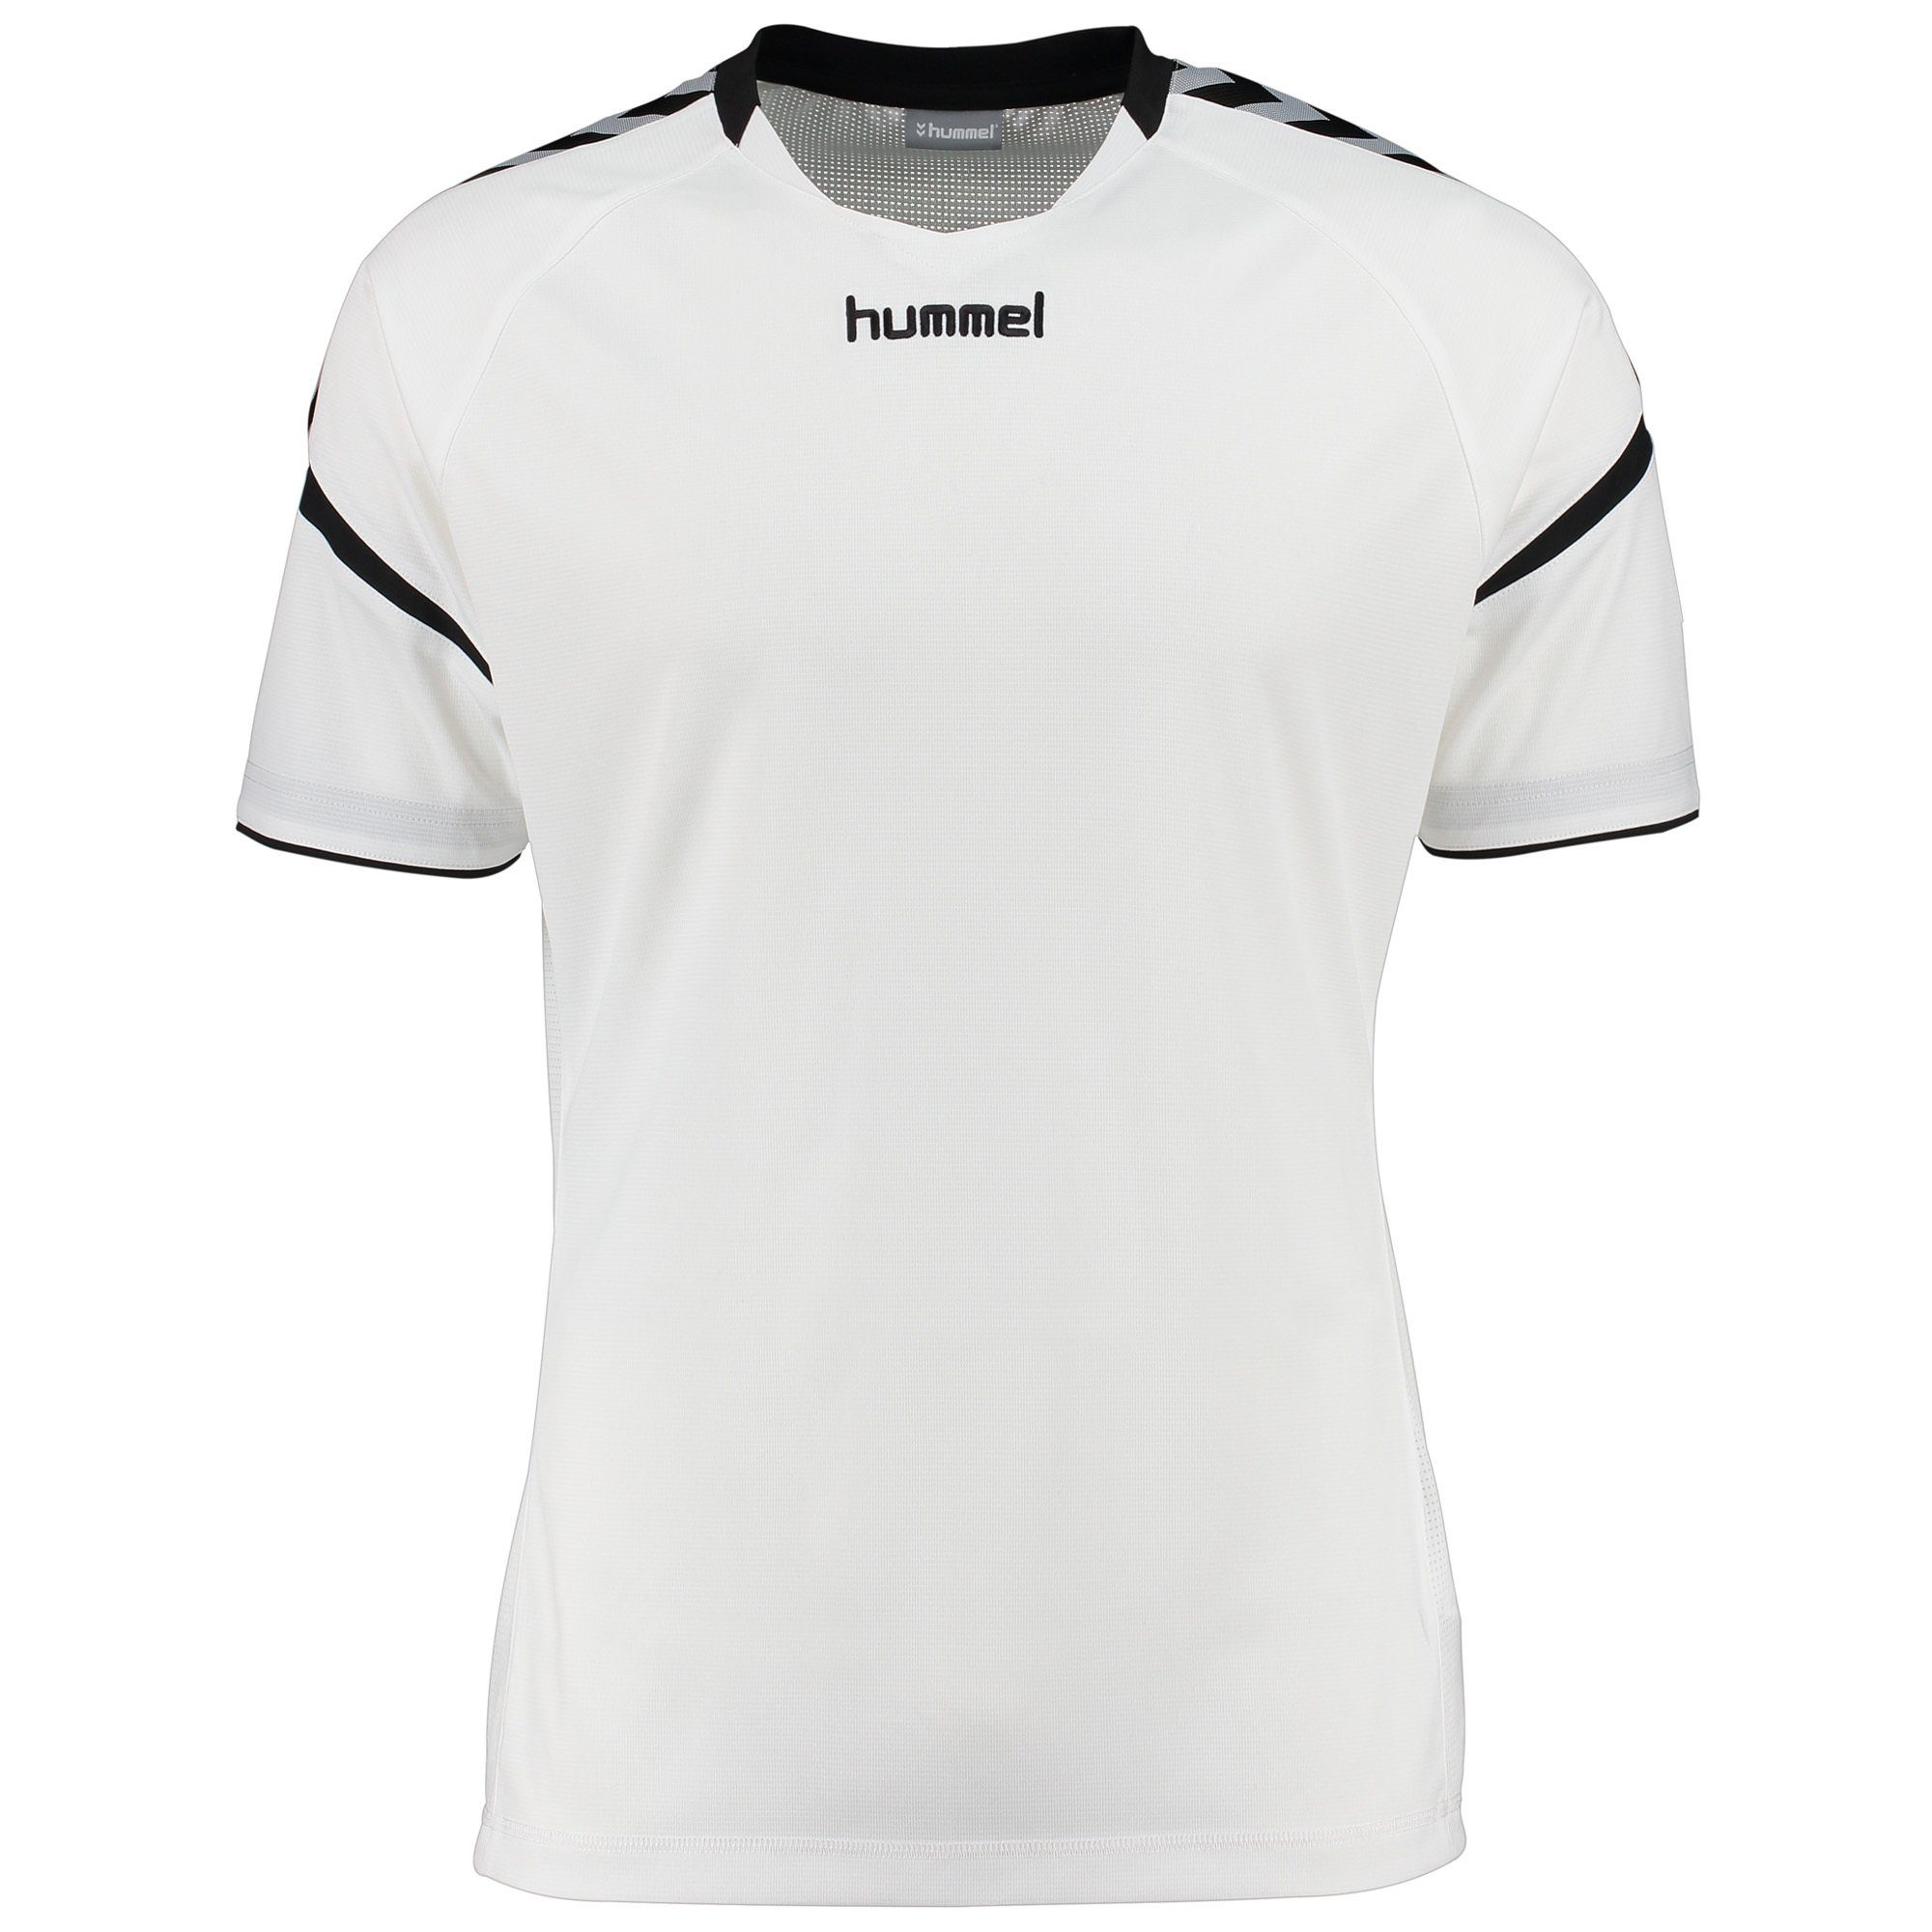 hummel Handballtrikot »Authentic Charge« | Sportbekleidung > Trikots > Handballtrikots | Weiß | Jersey - Trikot | Hummel